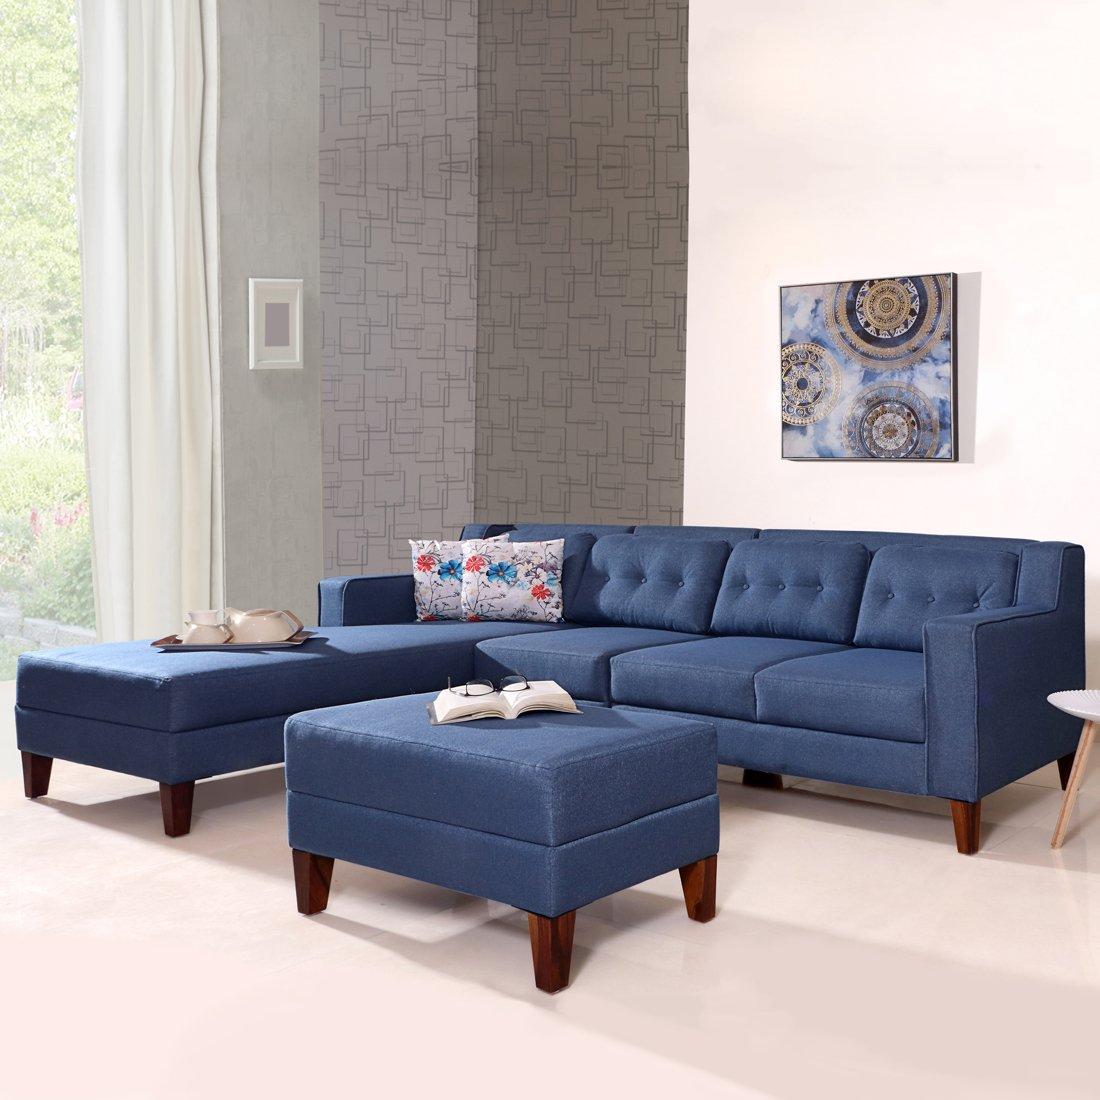 Buy Travis Fabric L Shape Sofa Left With Pouf Light Blue Online Evok